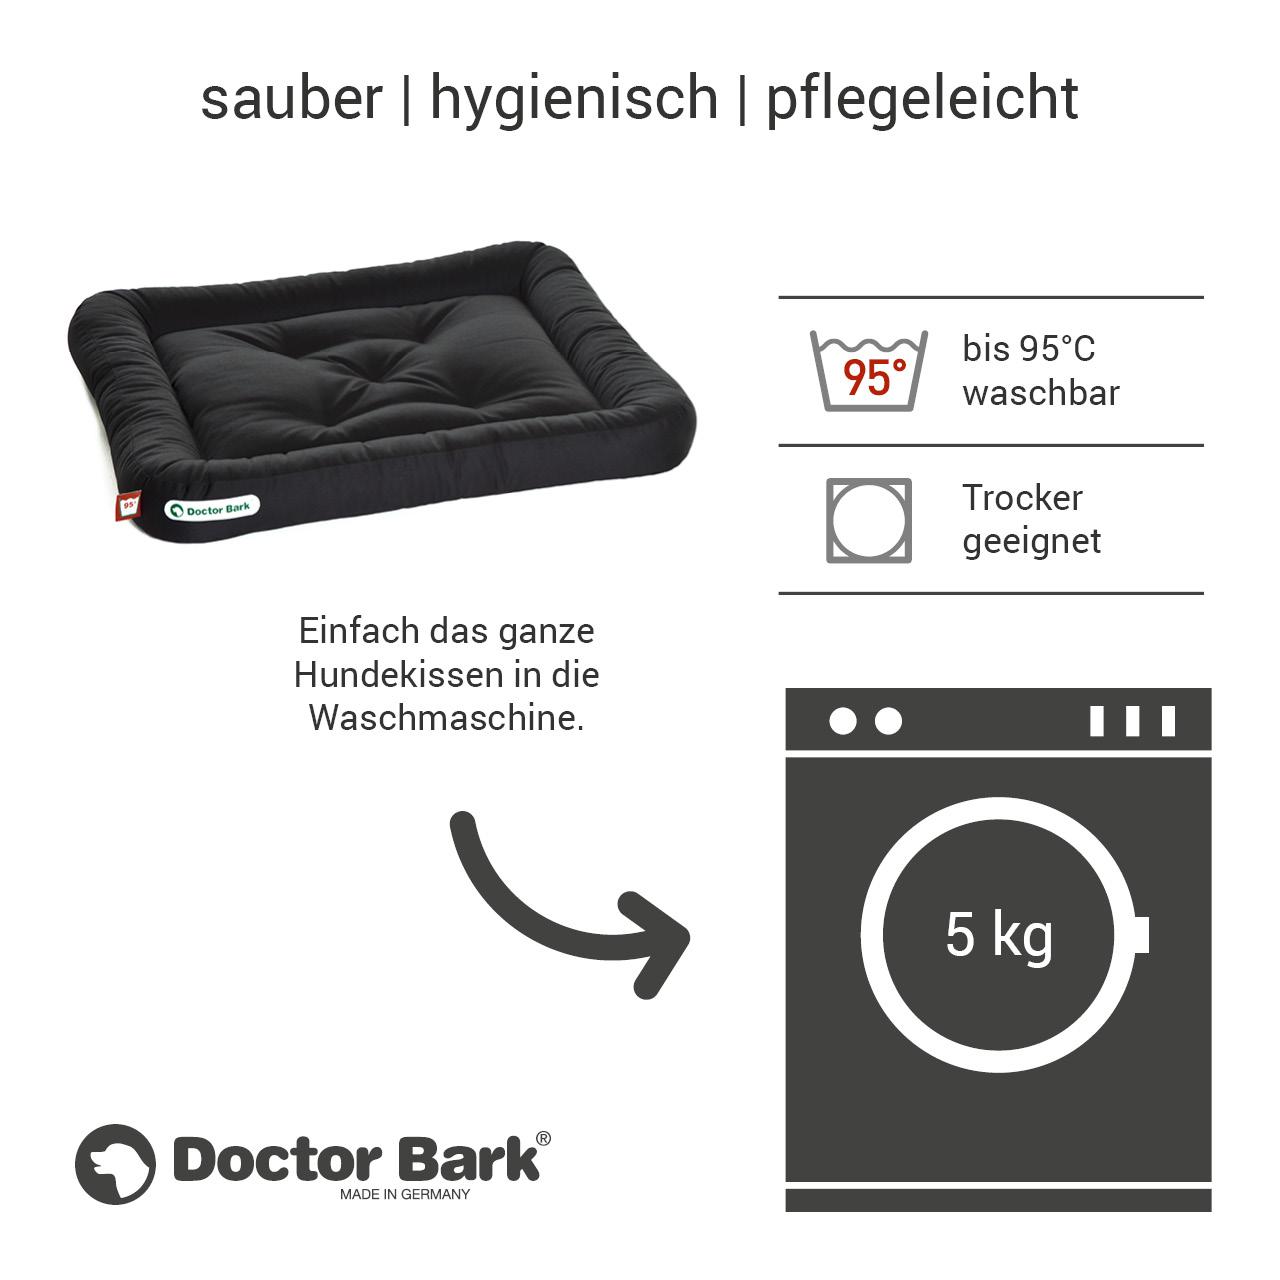 Lounge-Hundekissen / Hundebett orthopädisch Doctor Bark waschbar schwarz - Gr. M